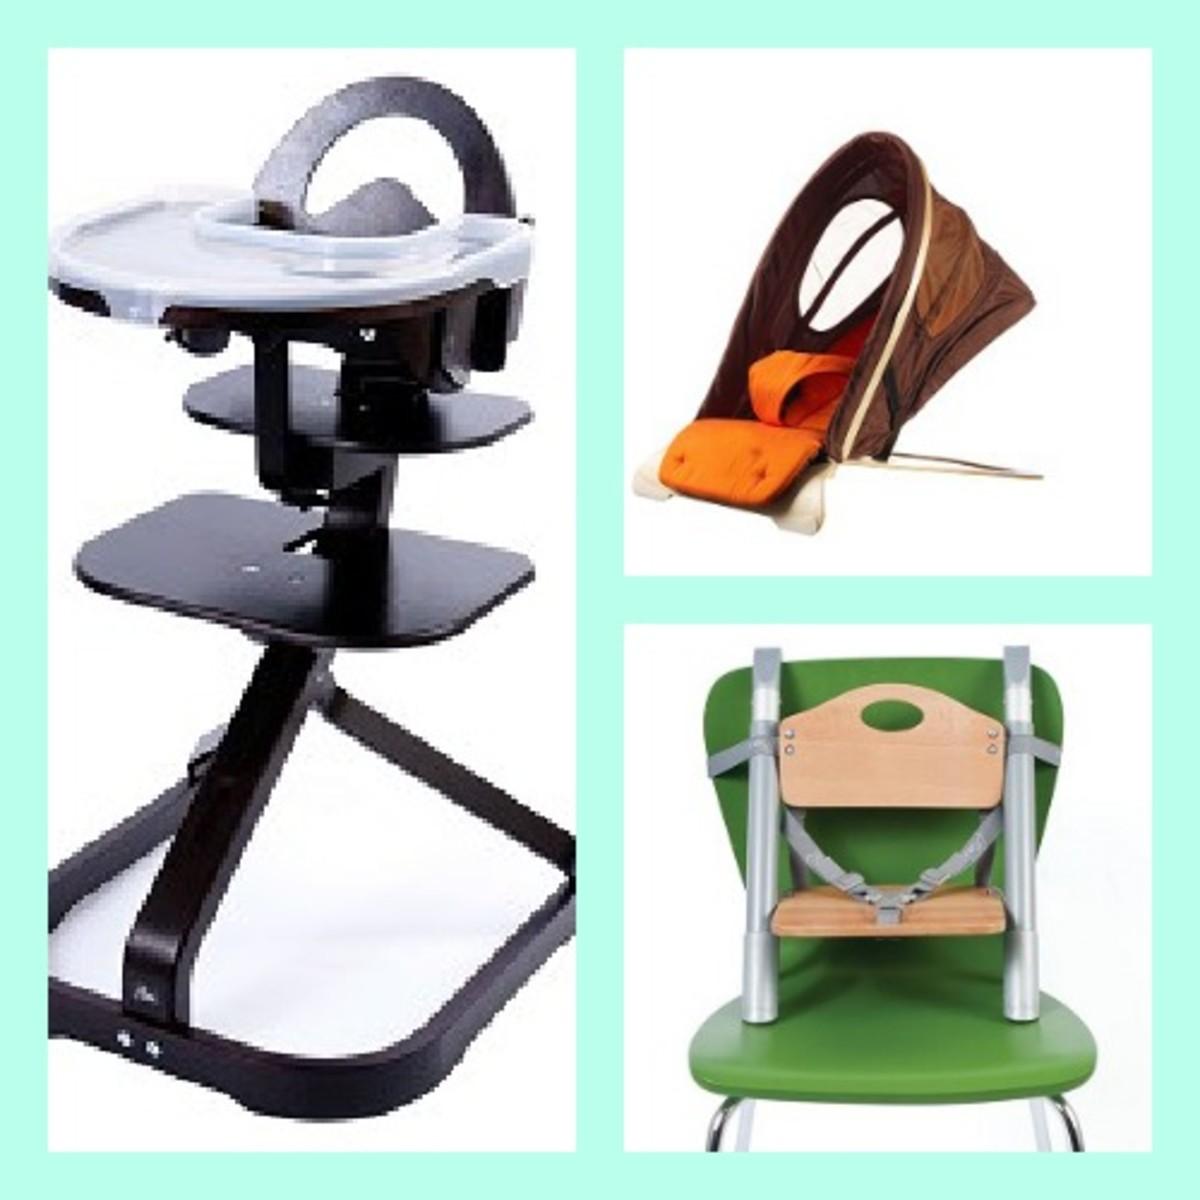 Functional and fun kids 39 furniture from svan momtrendsmomtrends - Svan table and chair set ...